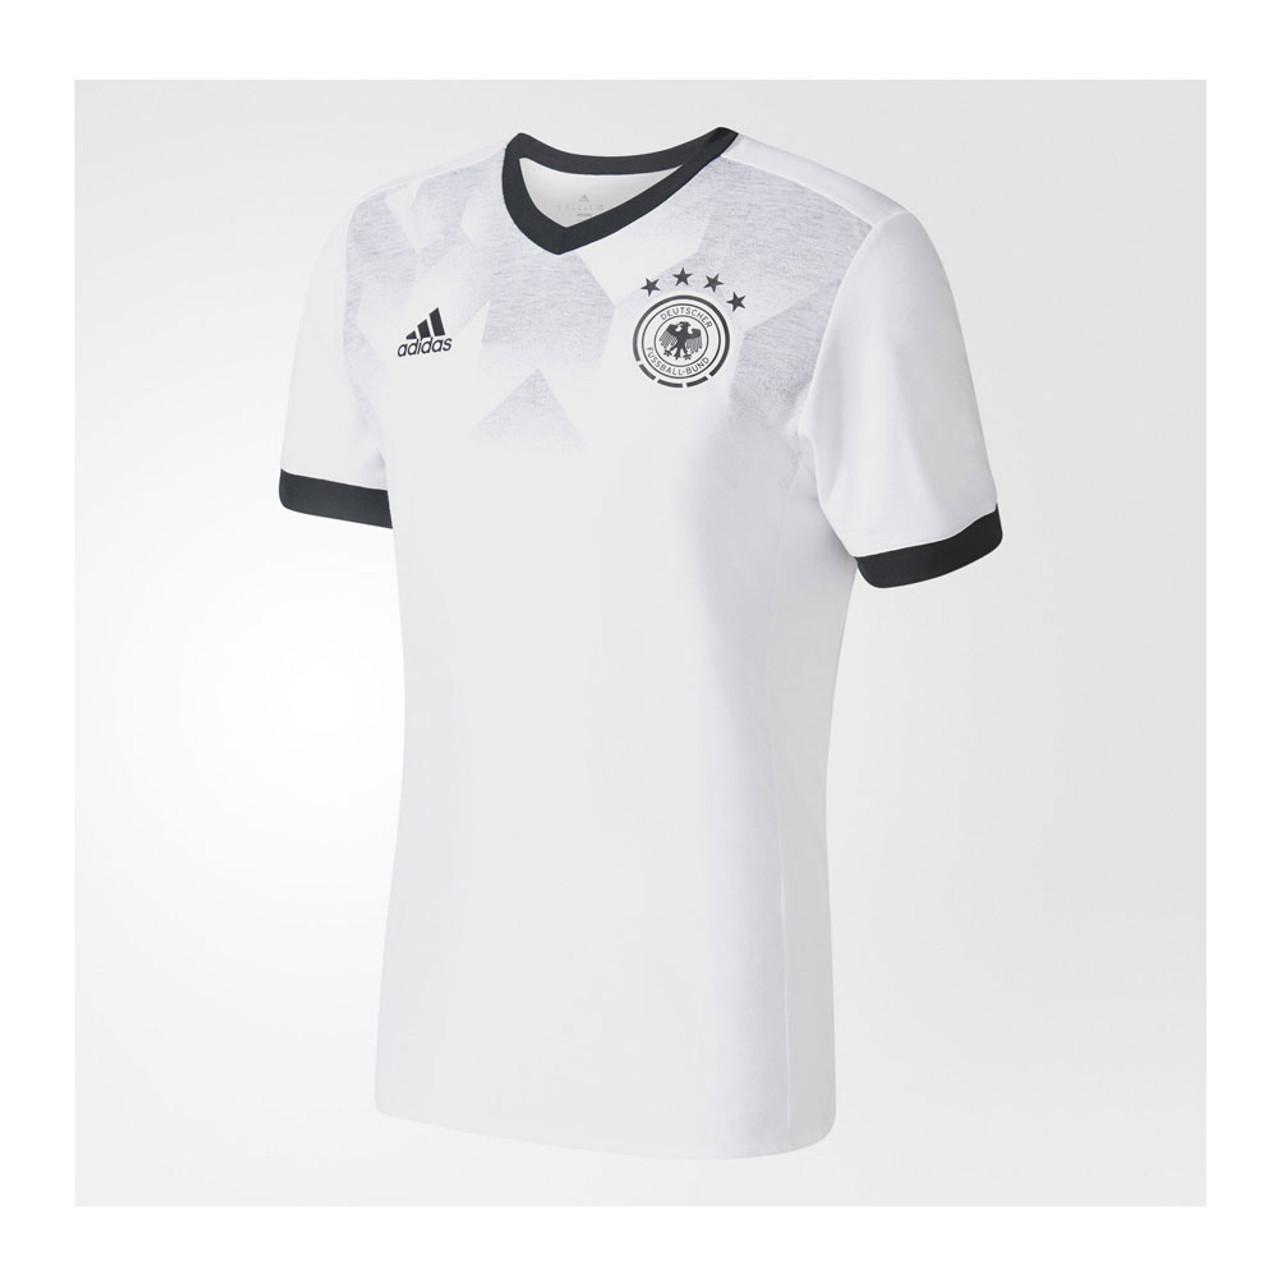 ef8b853473d ADIDAS germany football pre-match jersey  white